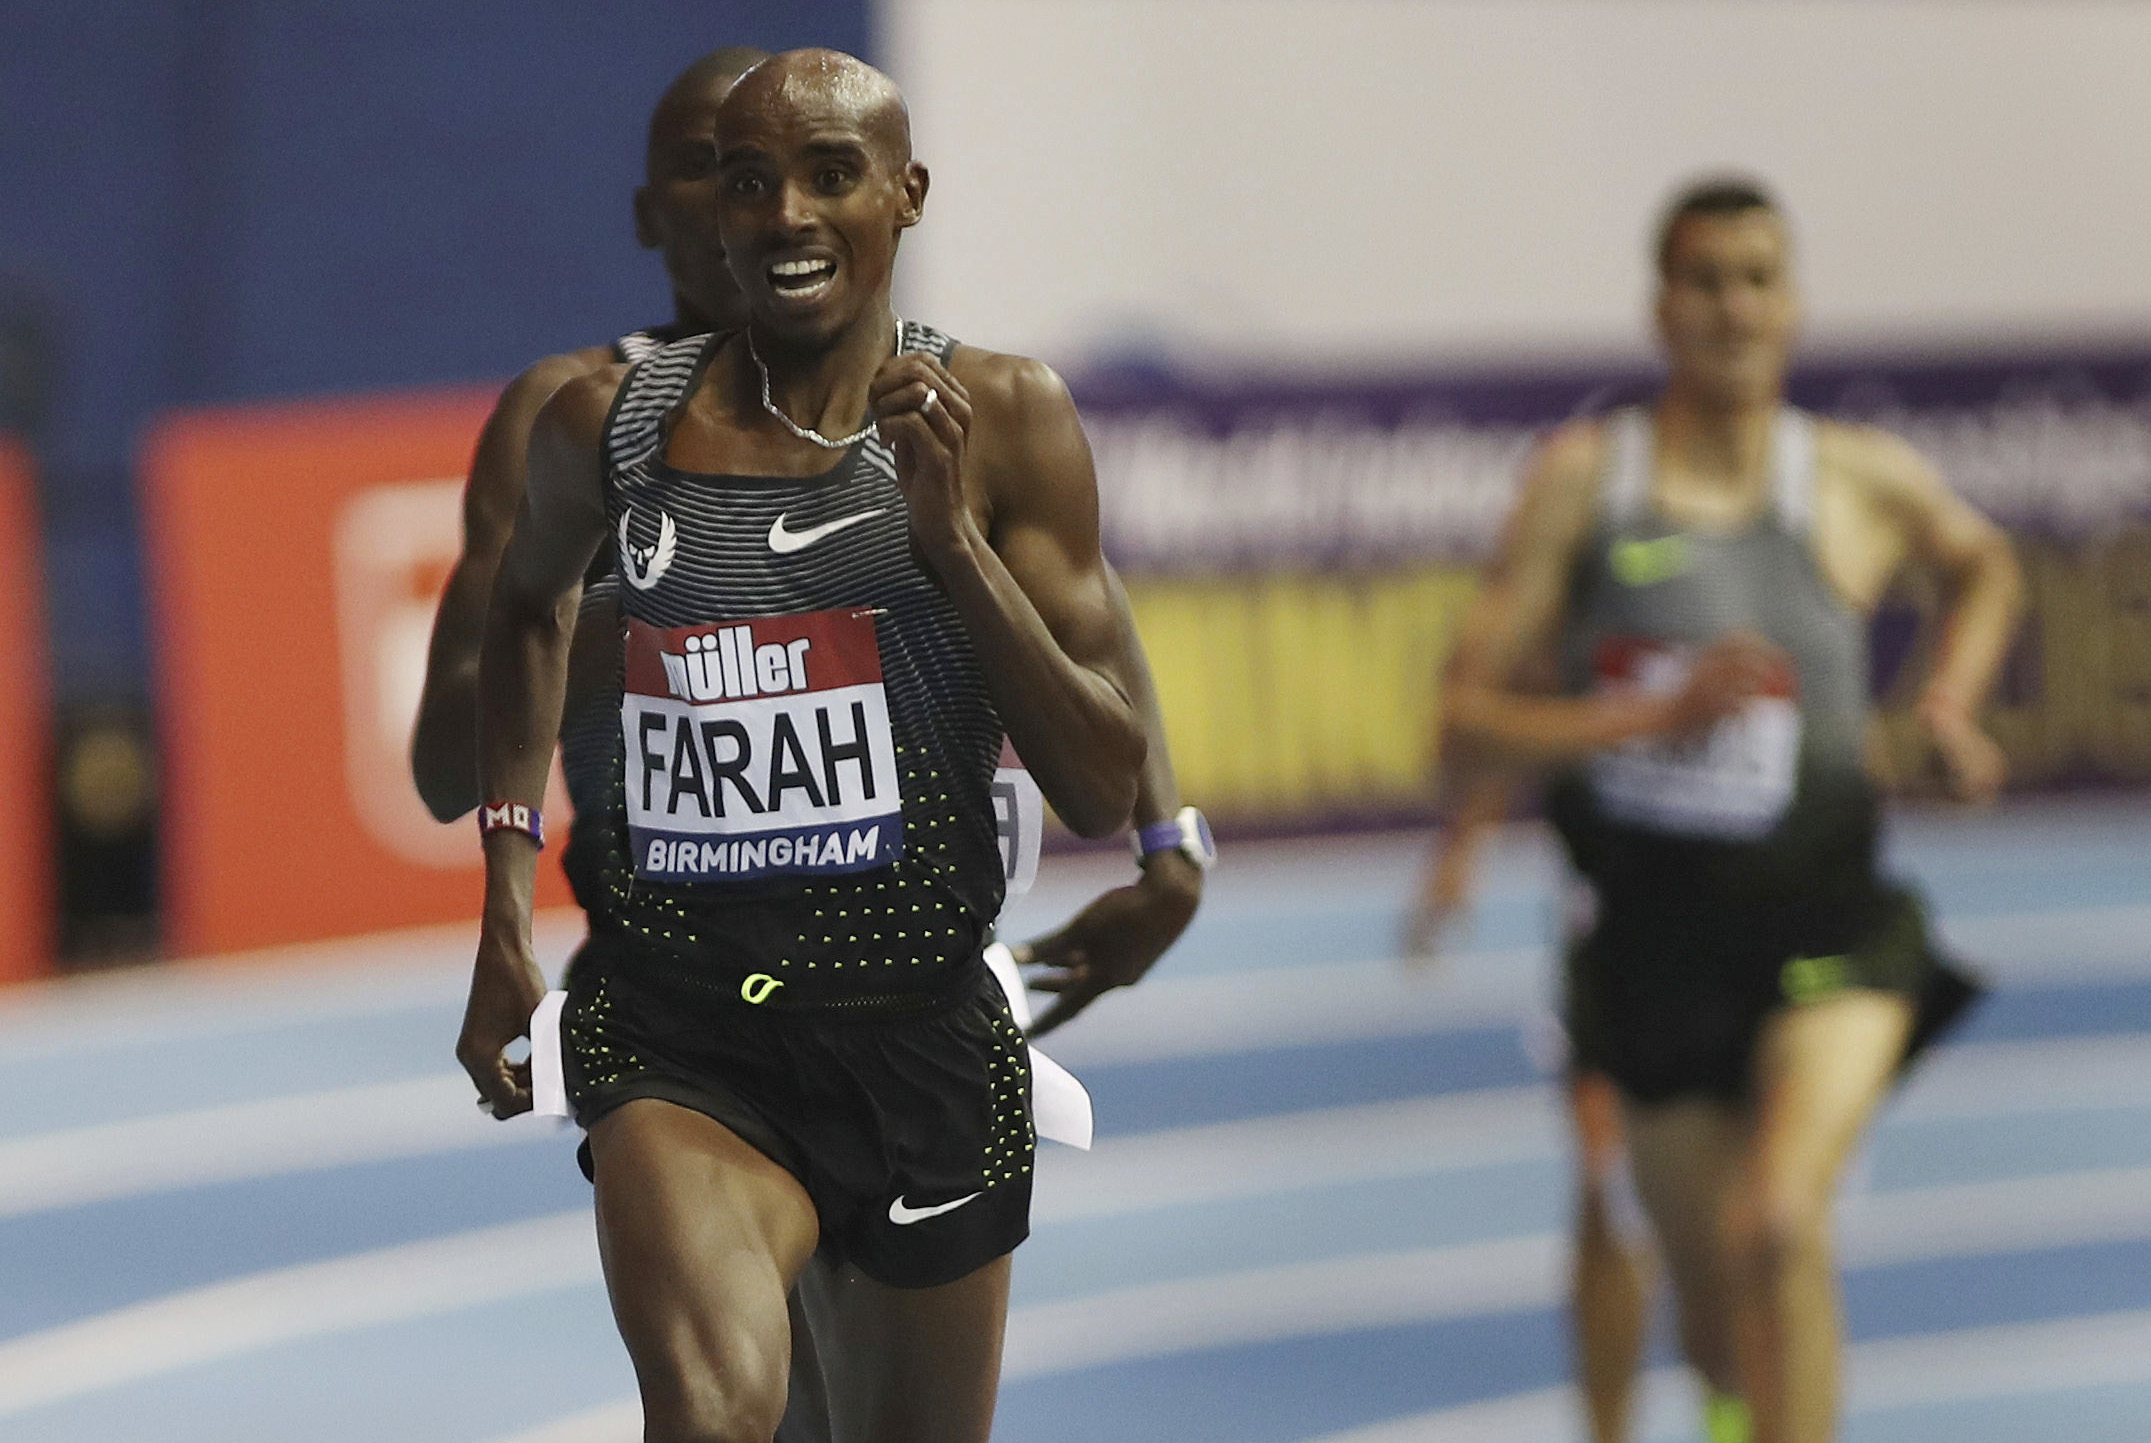 Britain's Mo Farah wins the 5000m during the Indoor Grand Prix at the Barclaycard Arena, Birmingham, England, Saturday Feb. 18, 2017. (David Davies/PA via AP)